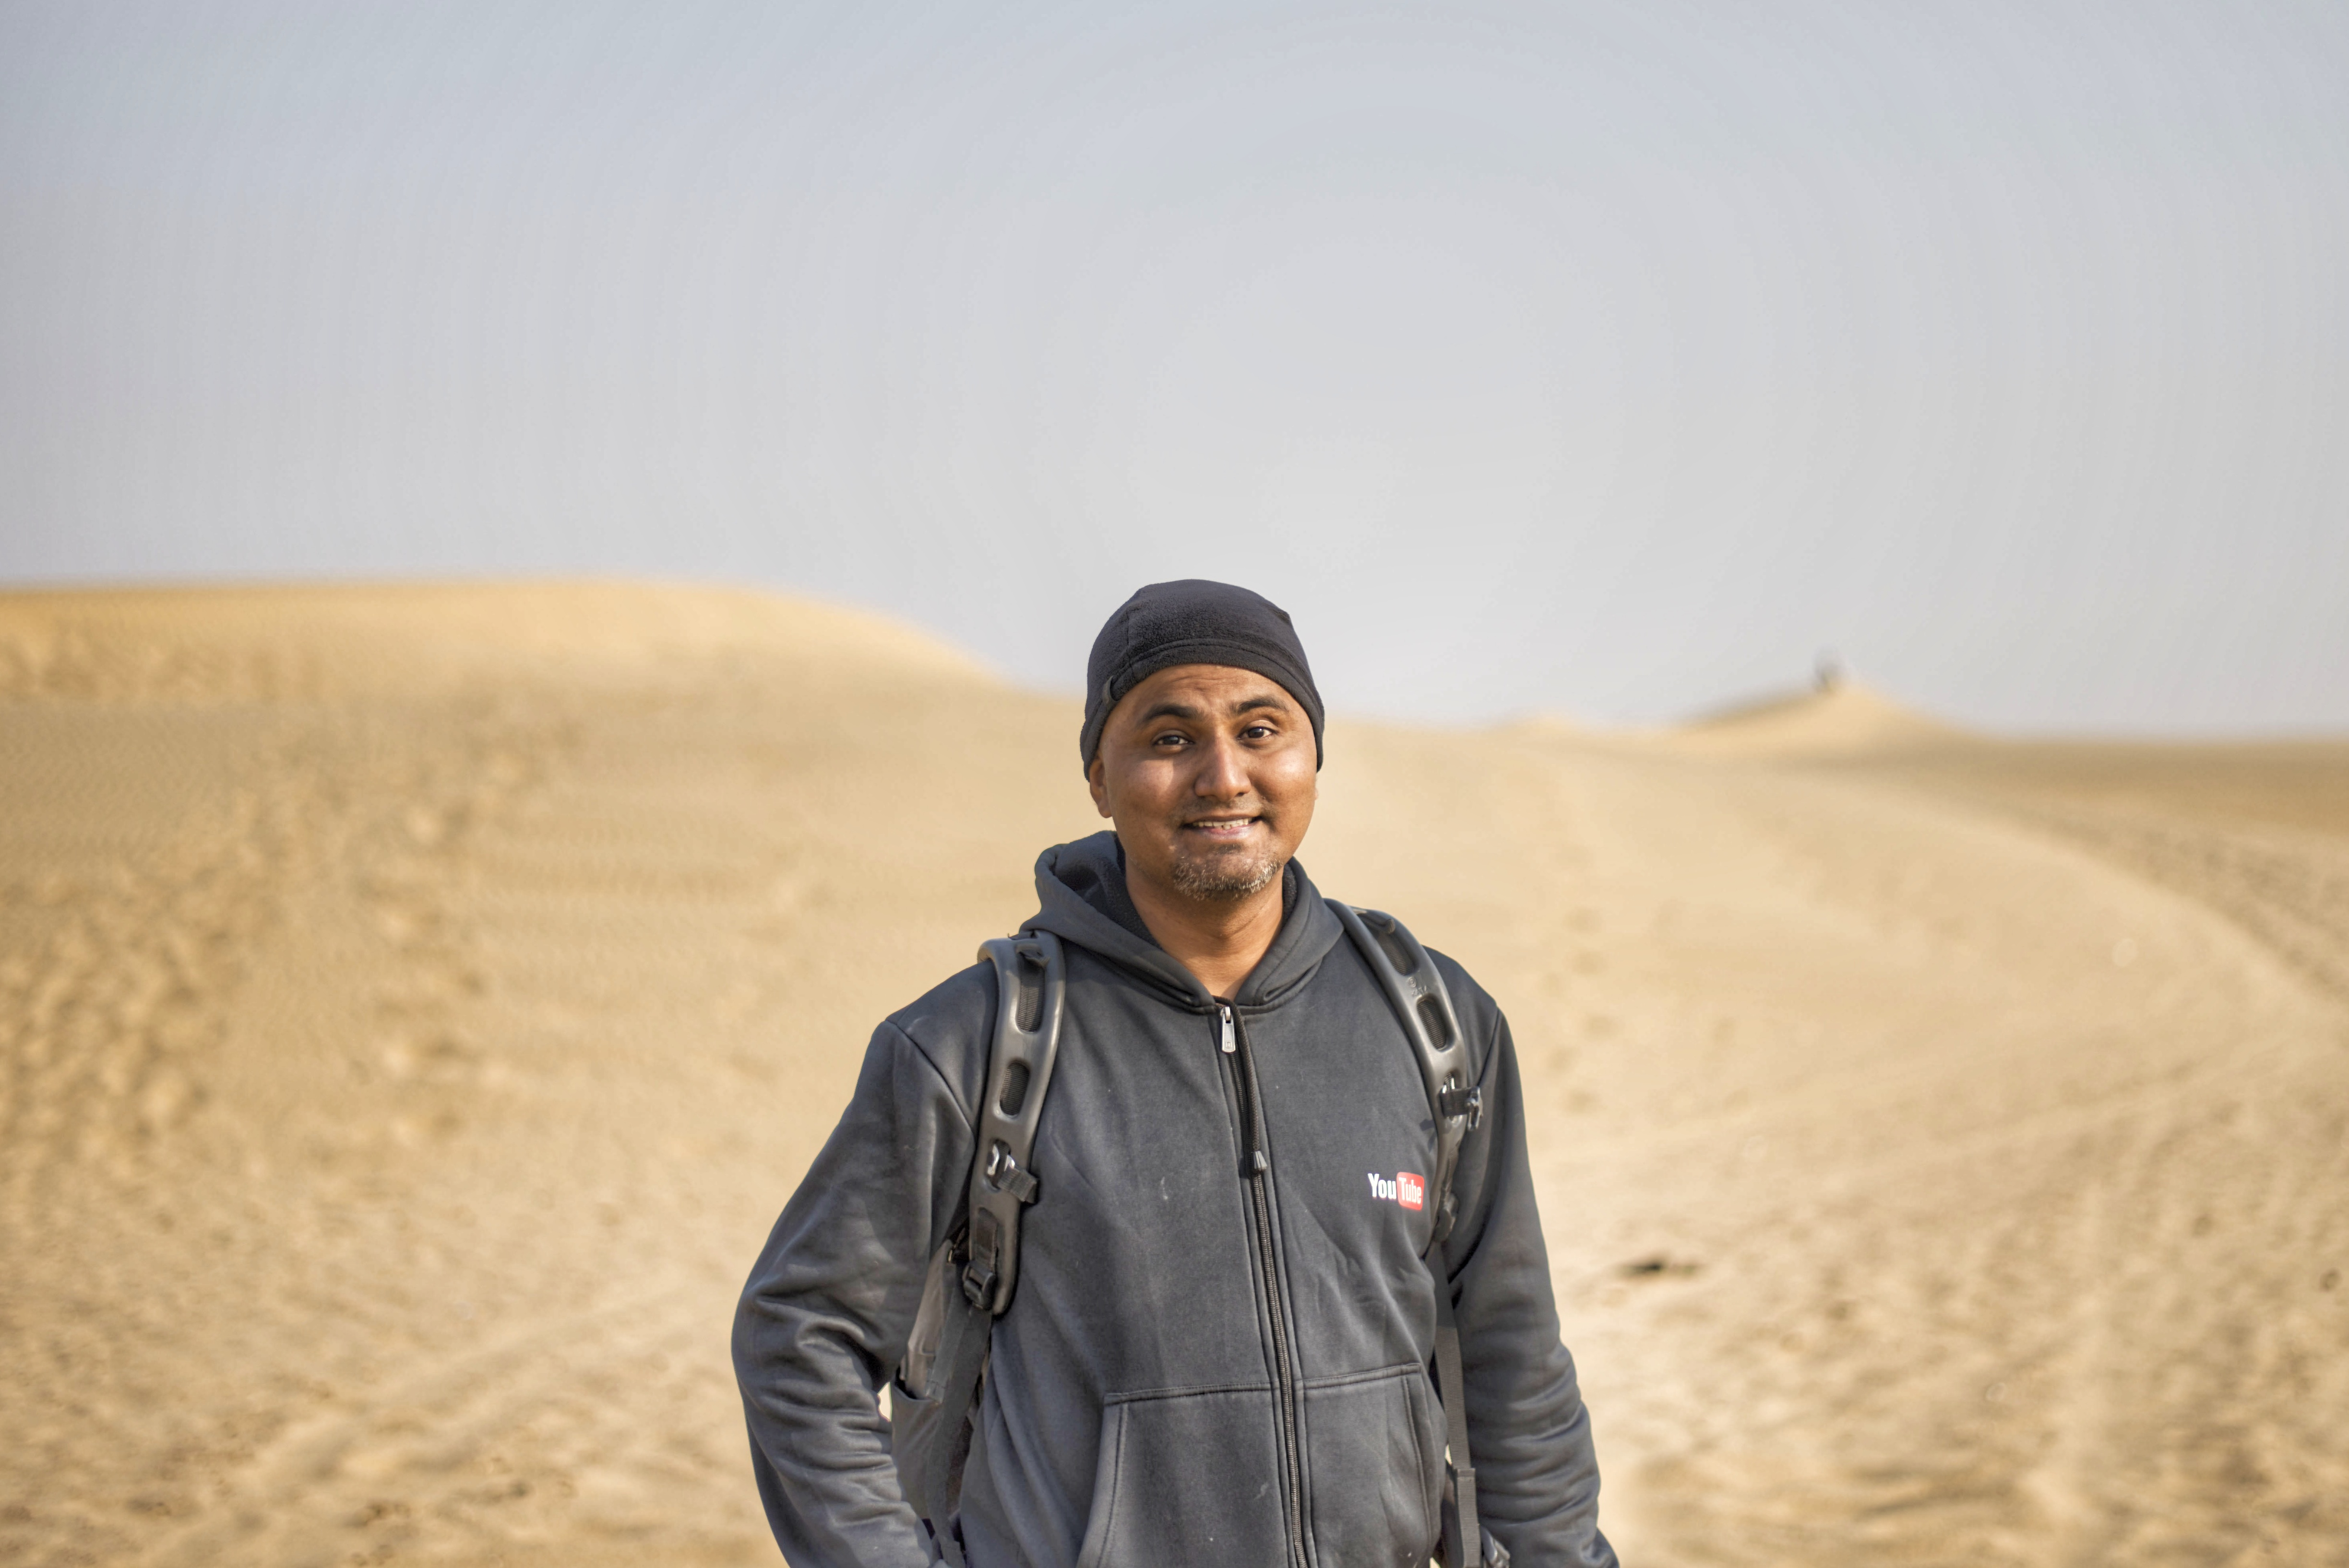 Akhil Khatri, Founder, Almost Social – Making everyone Photo-ready